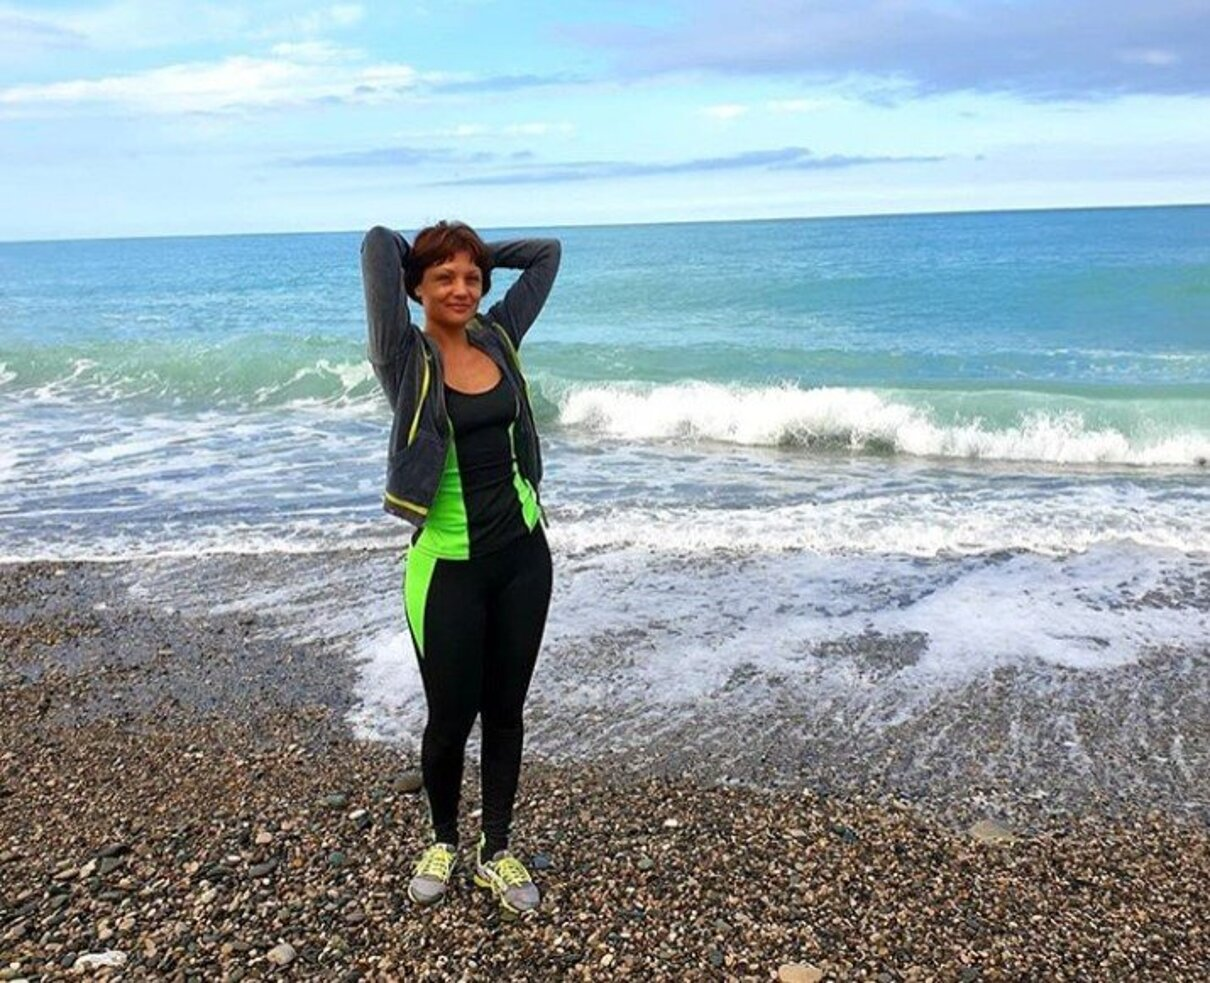 Жалоба-отзыв: Минаева Татьяна Александровна - Любовница председателя правления Глобал Безопасность